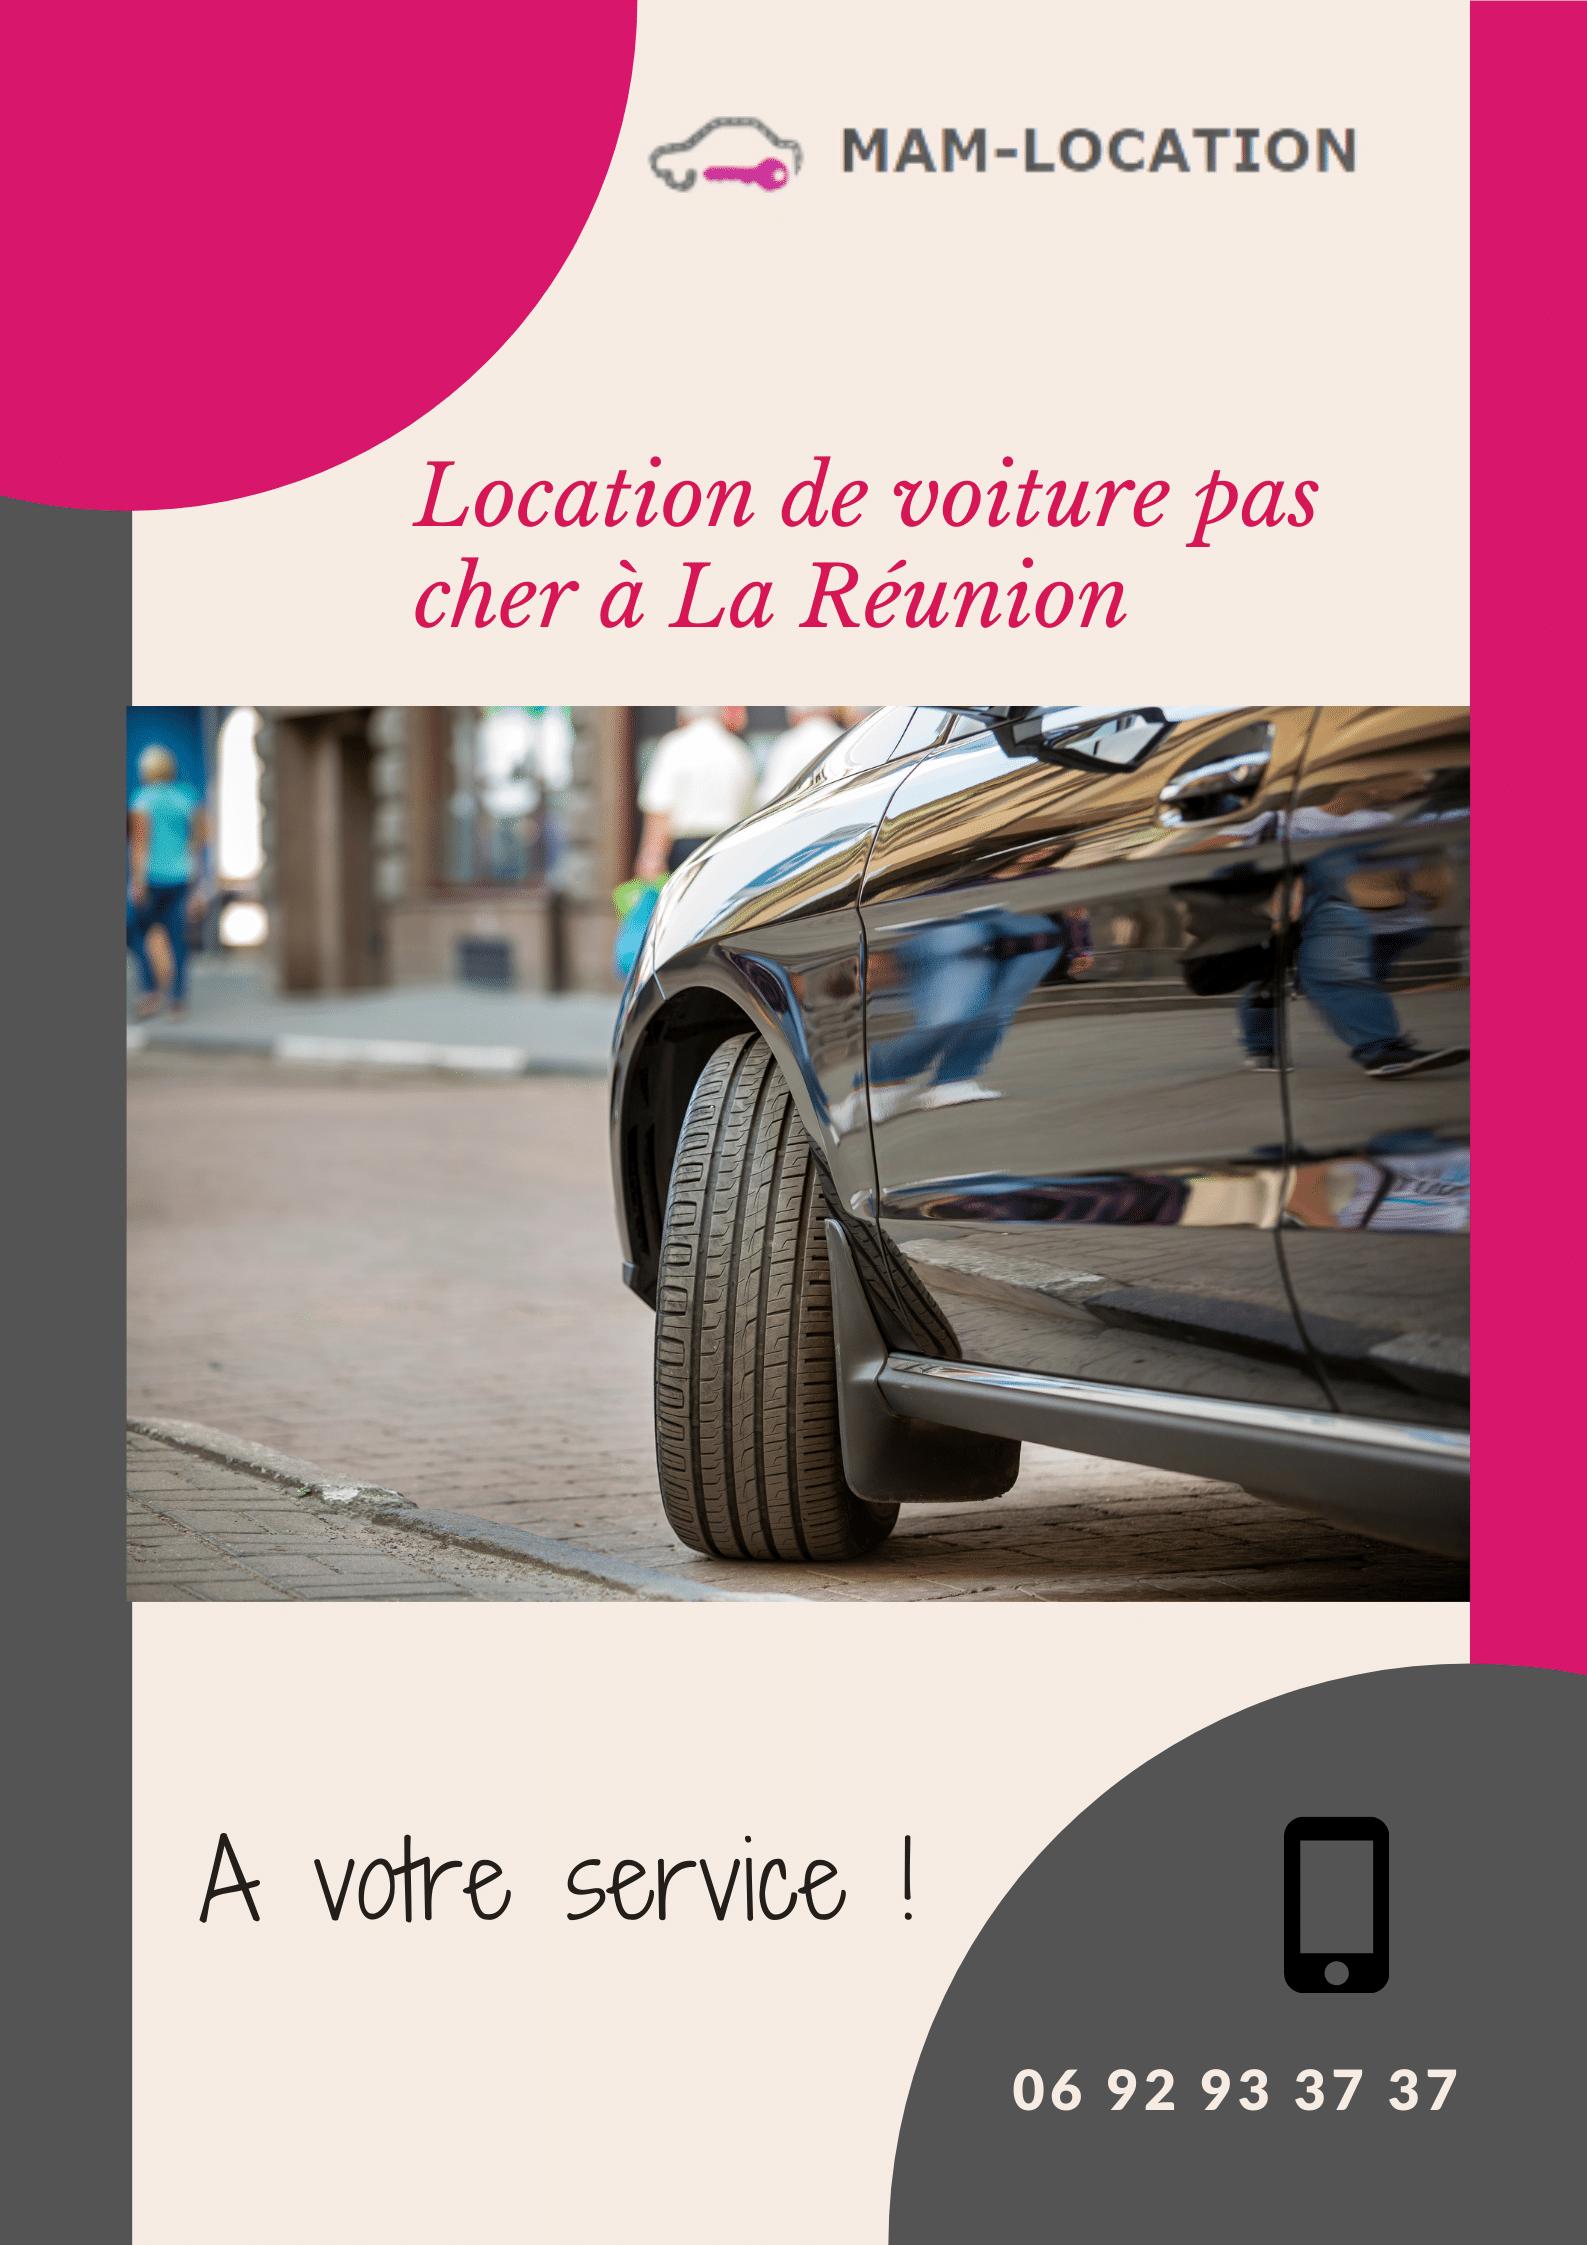 mam_location_conseils